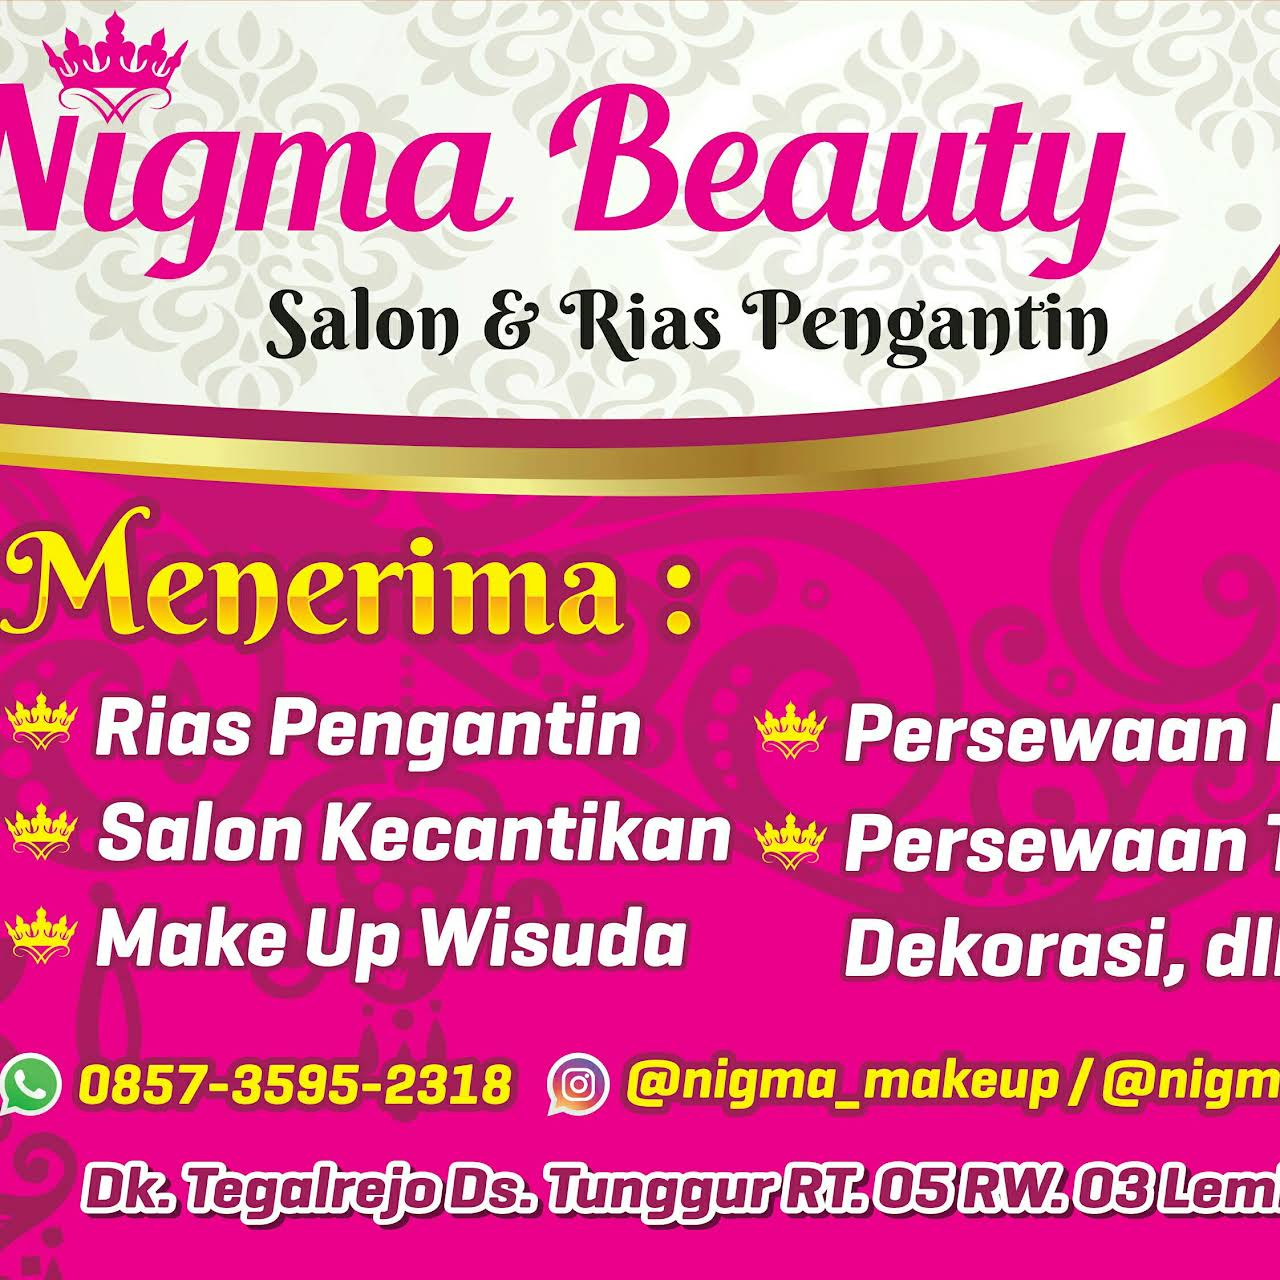 Nigma Beauty Salon Rias Pengantin Salon Kecantikan